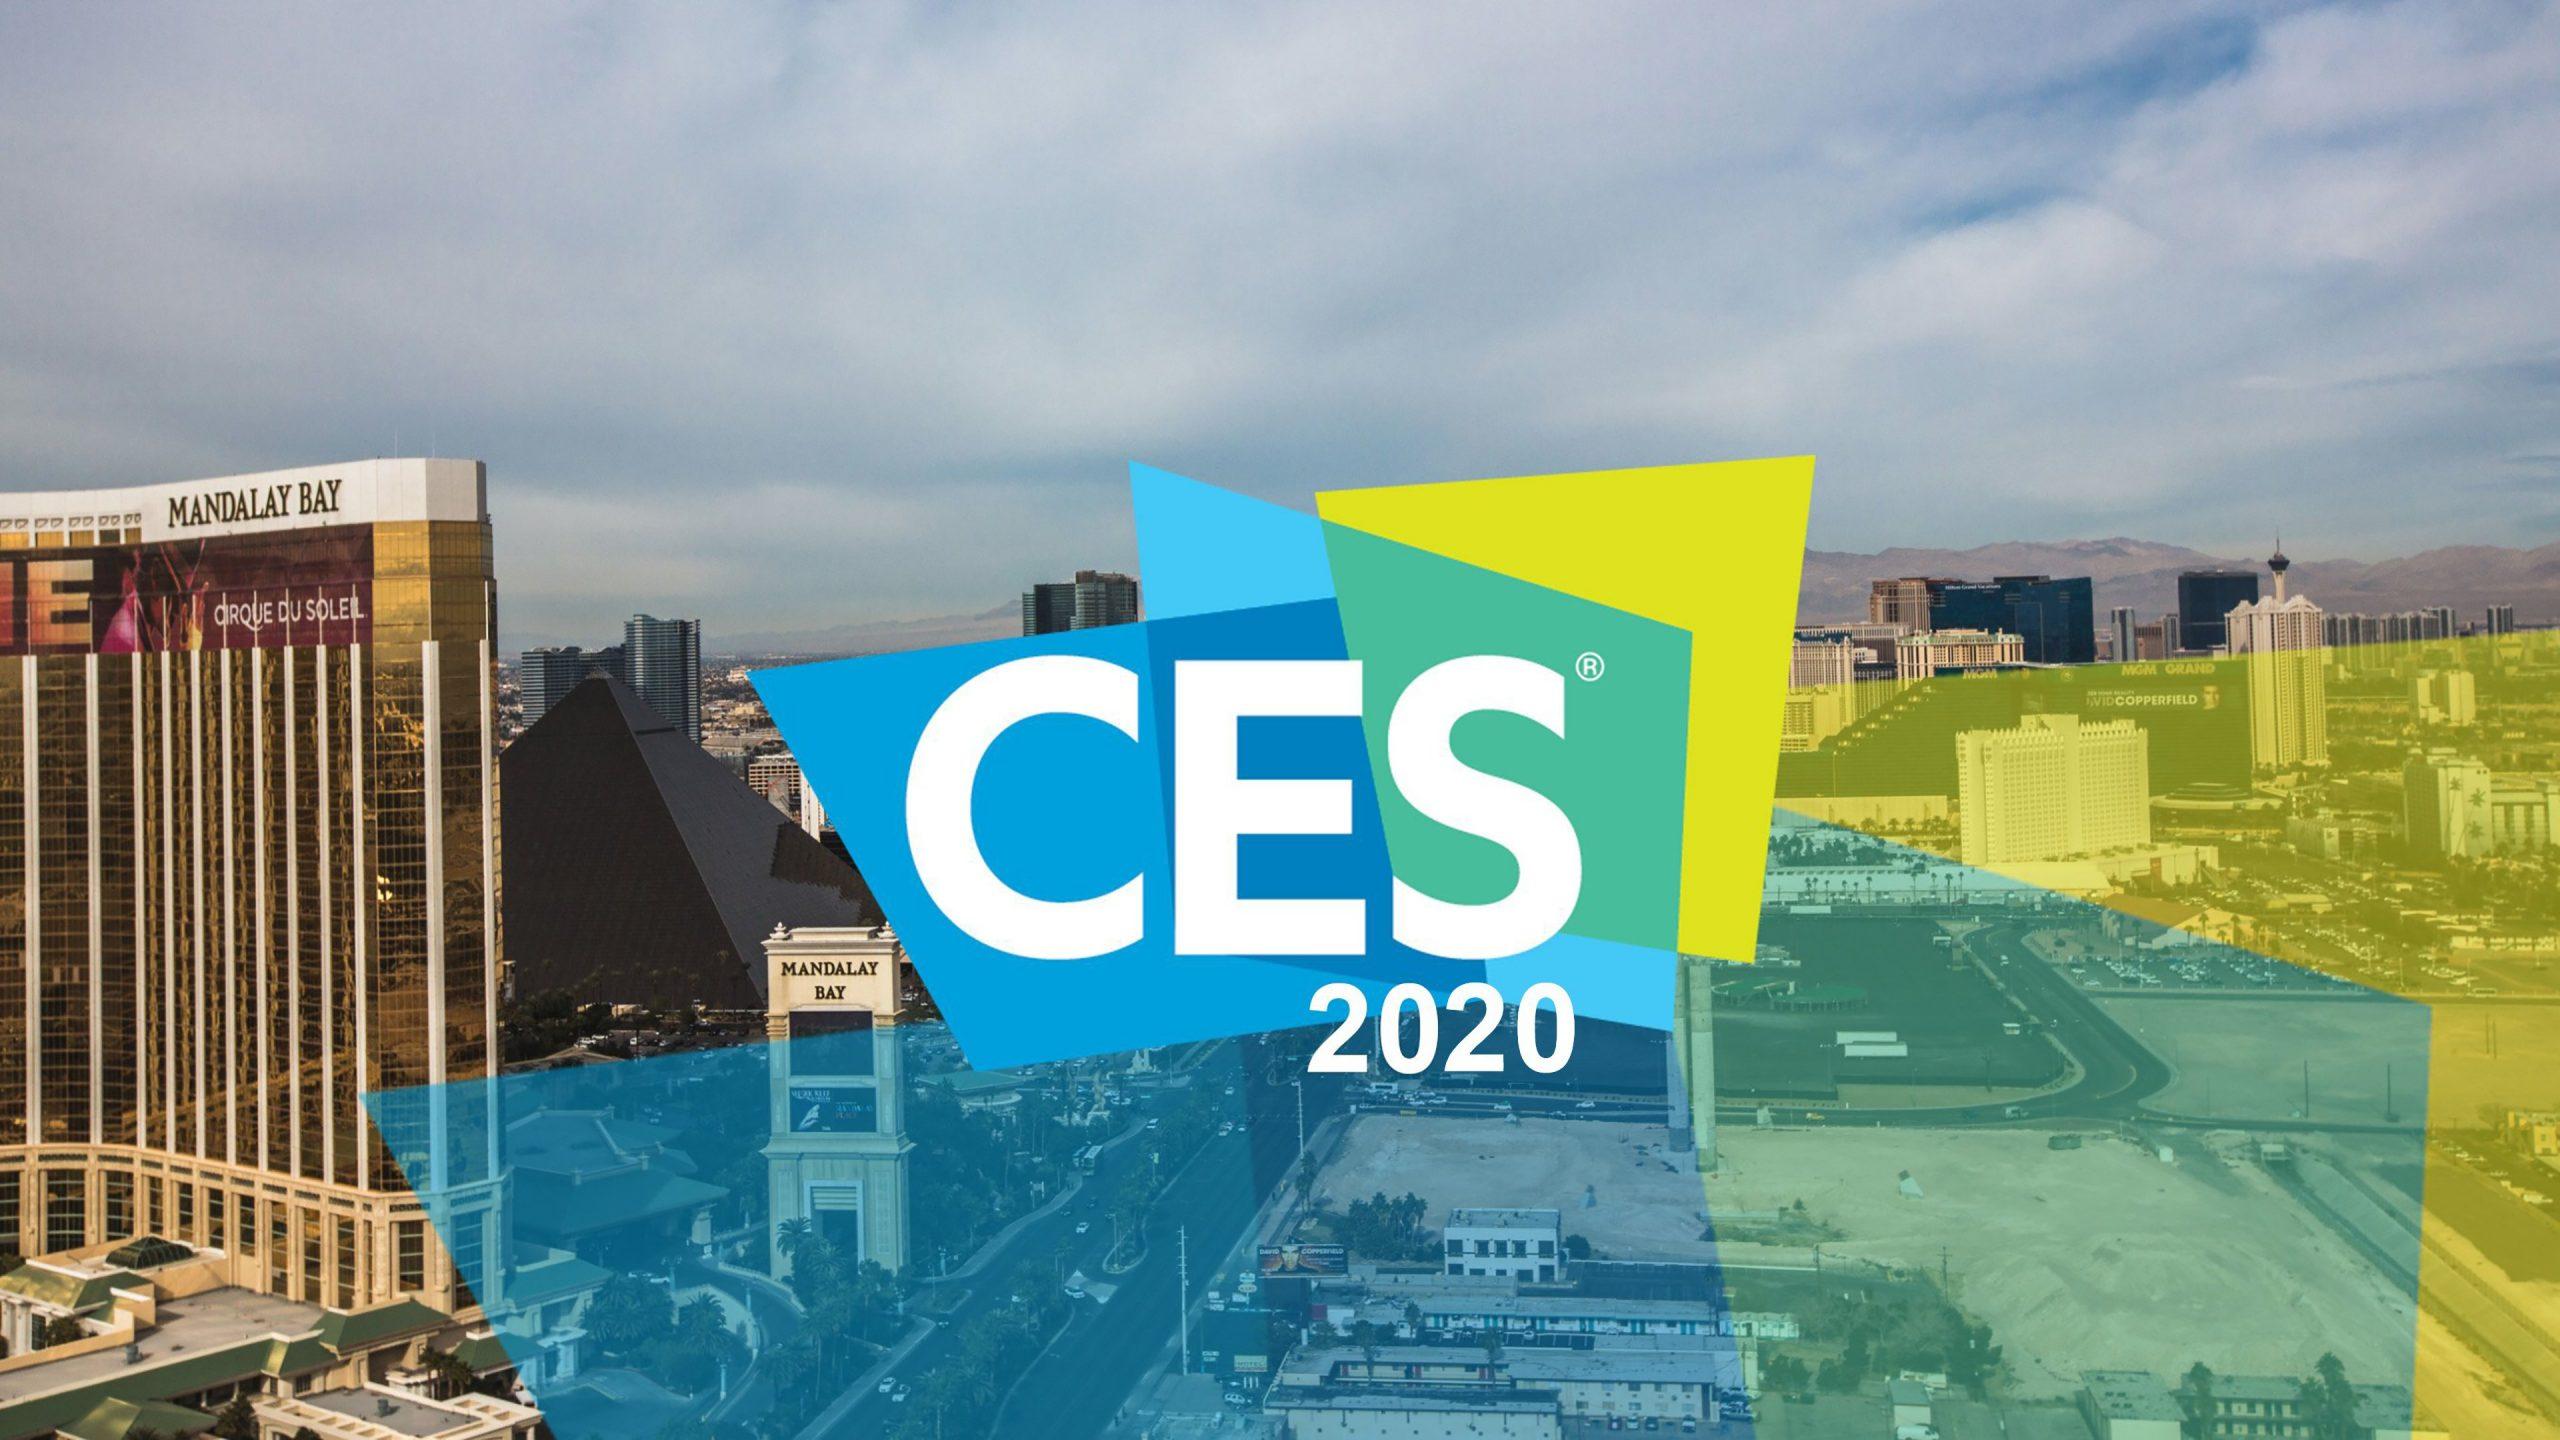 samsung-lg-prepare-to-showcase-latest-ai-technologies-at-ces-2020